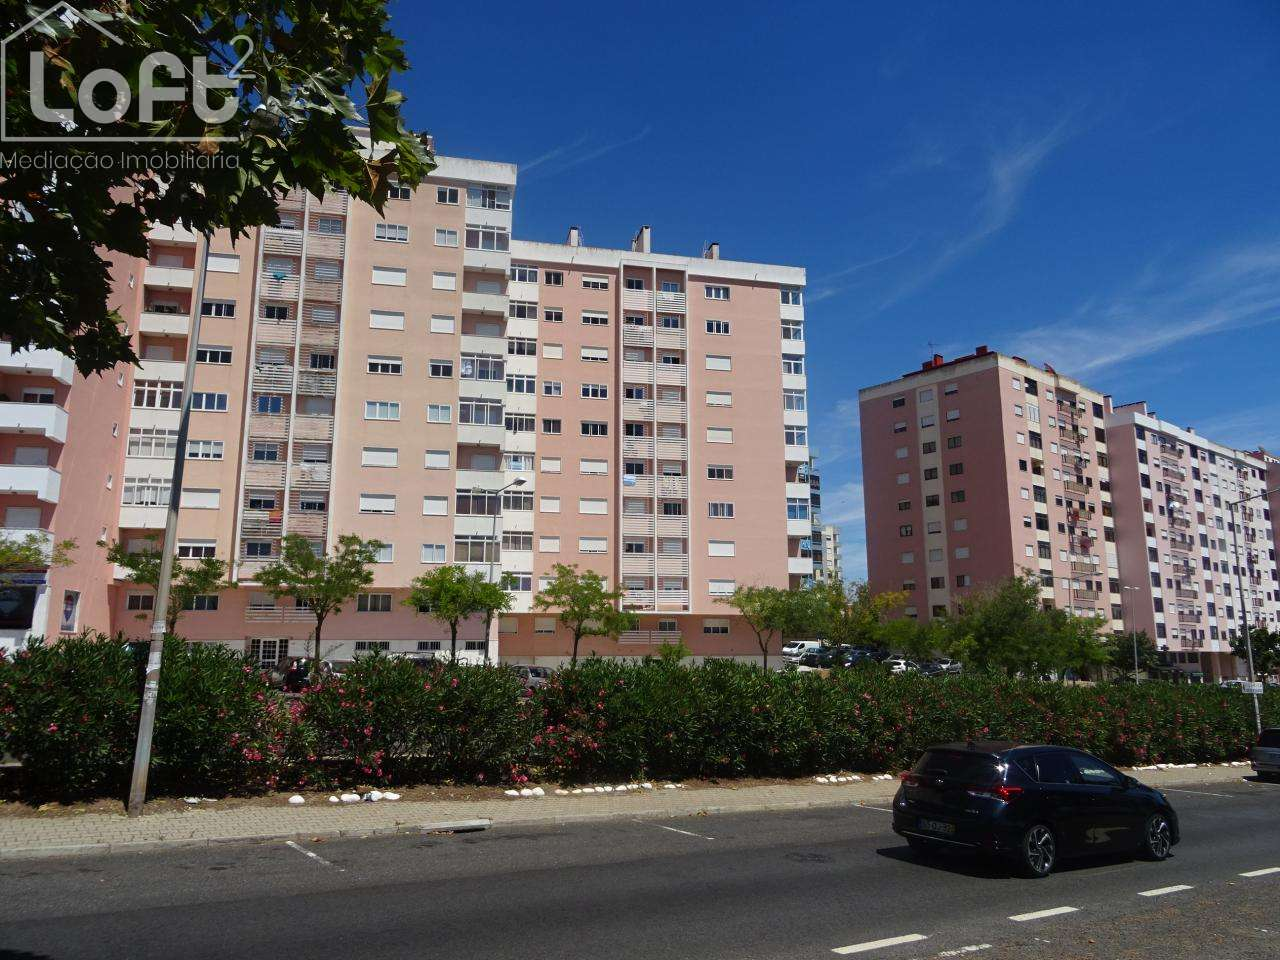 Apartamento para comprar, Porto Salvo, Oeiras, Lisboa - Foto 1